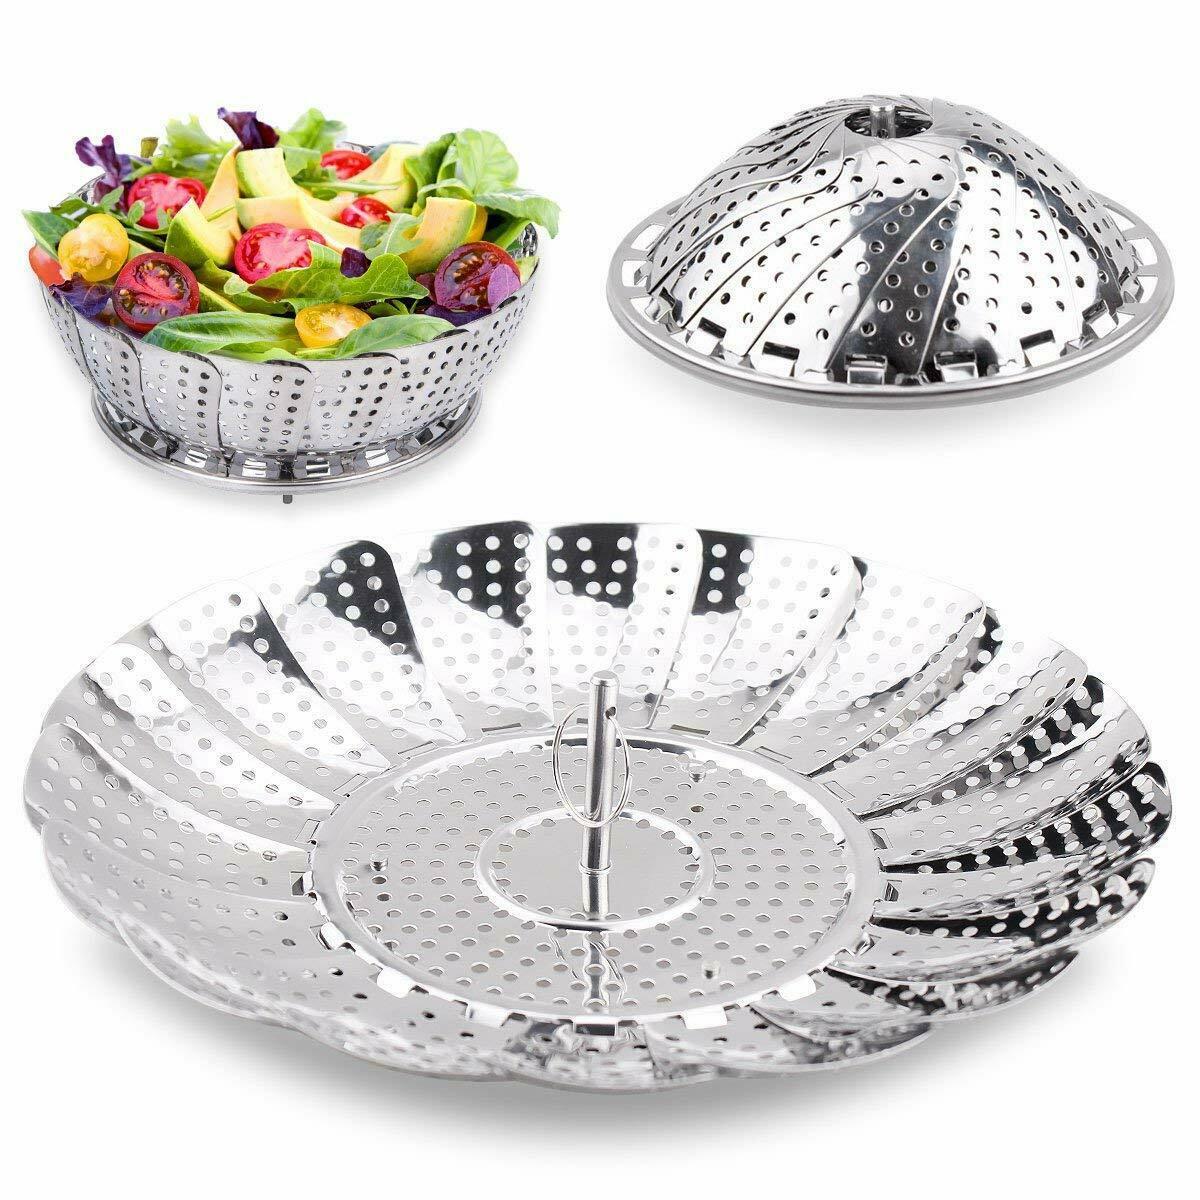 Stainless Steel Vegetable Steamer Basket Dumpling Basket Fruit Steam Tray